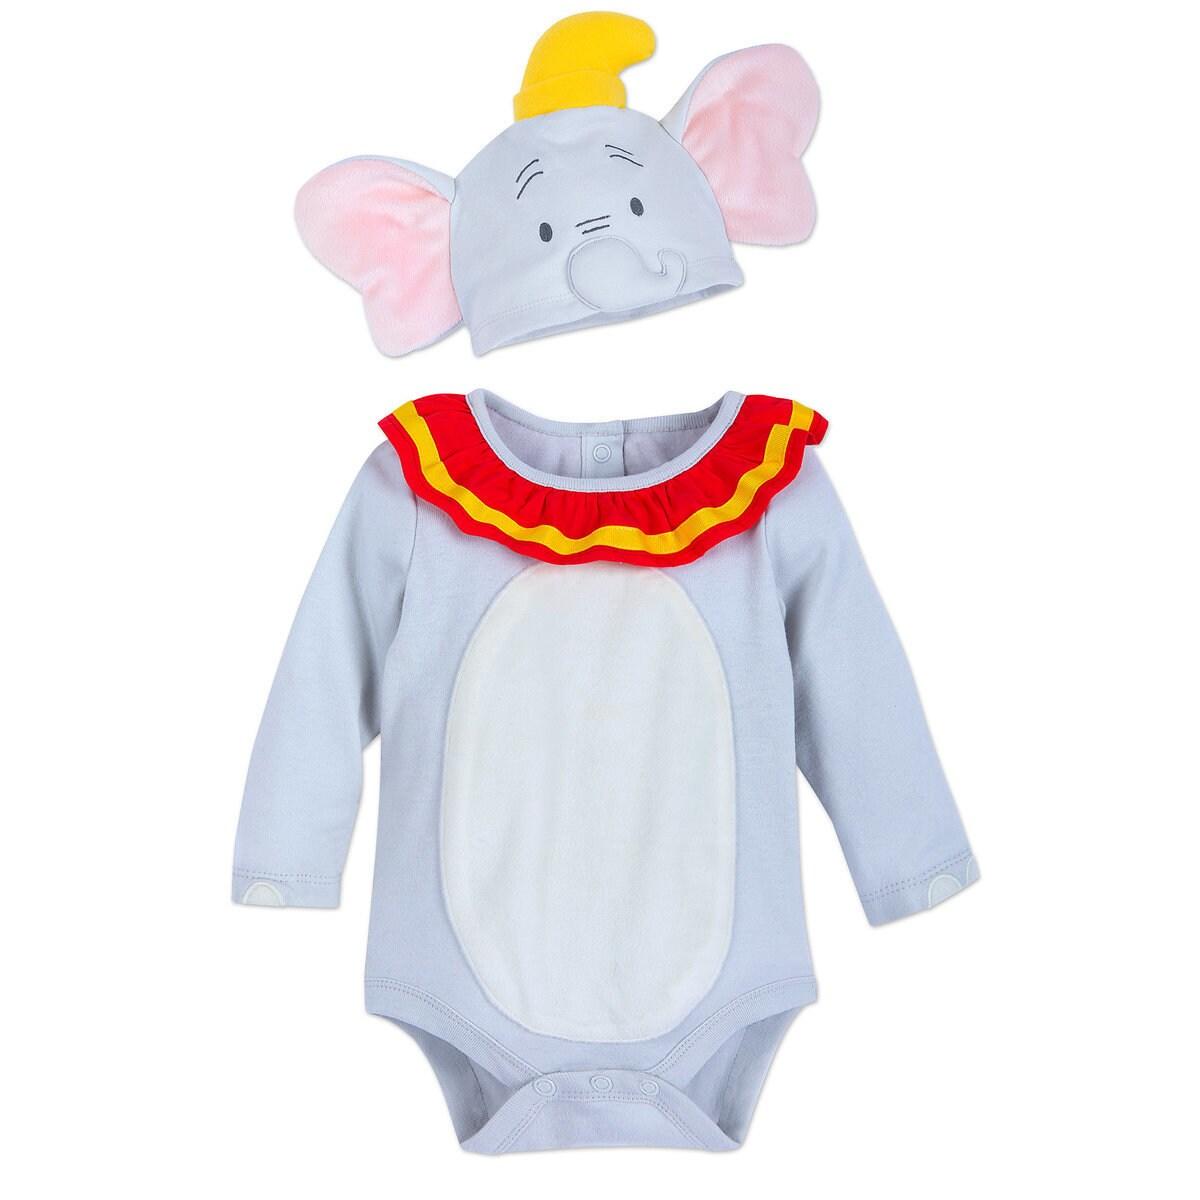 69f146672 Product Image of Dumbo Costume Bodysuit Set for Baby # 1